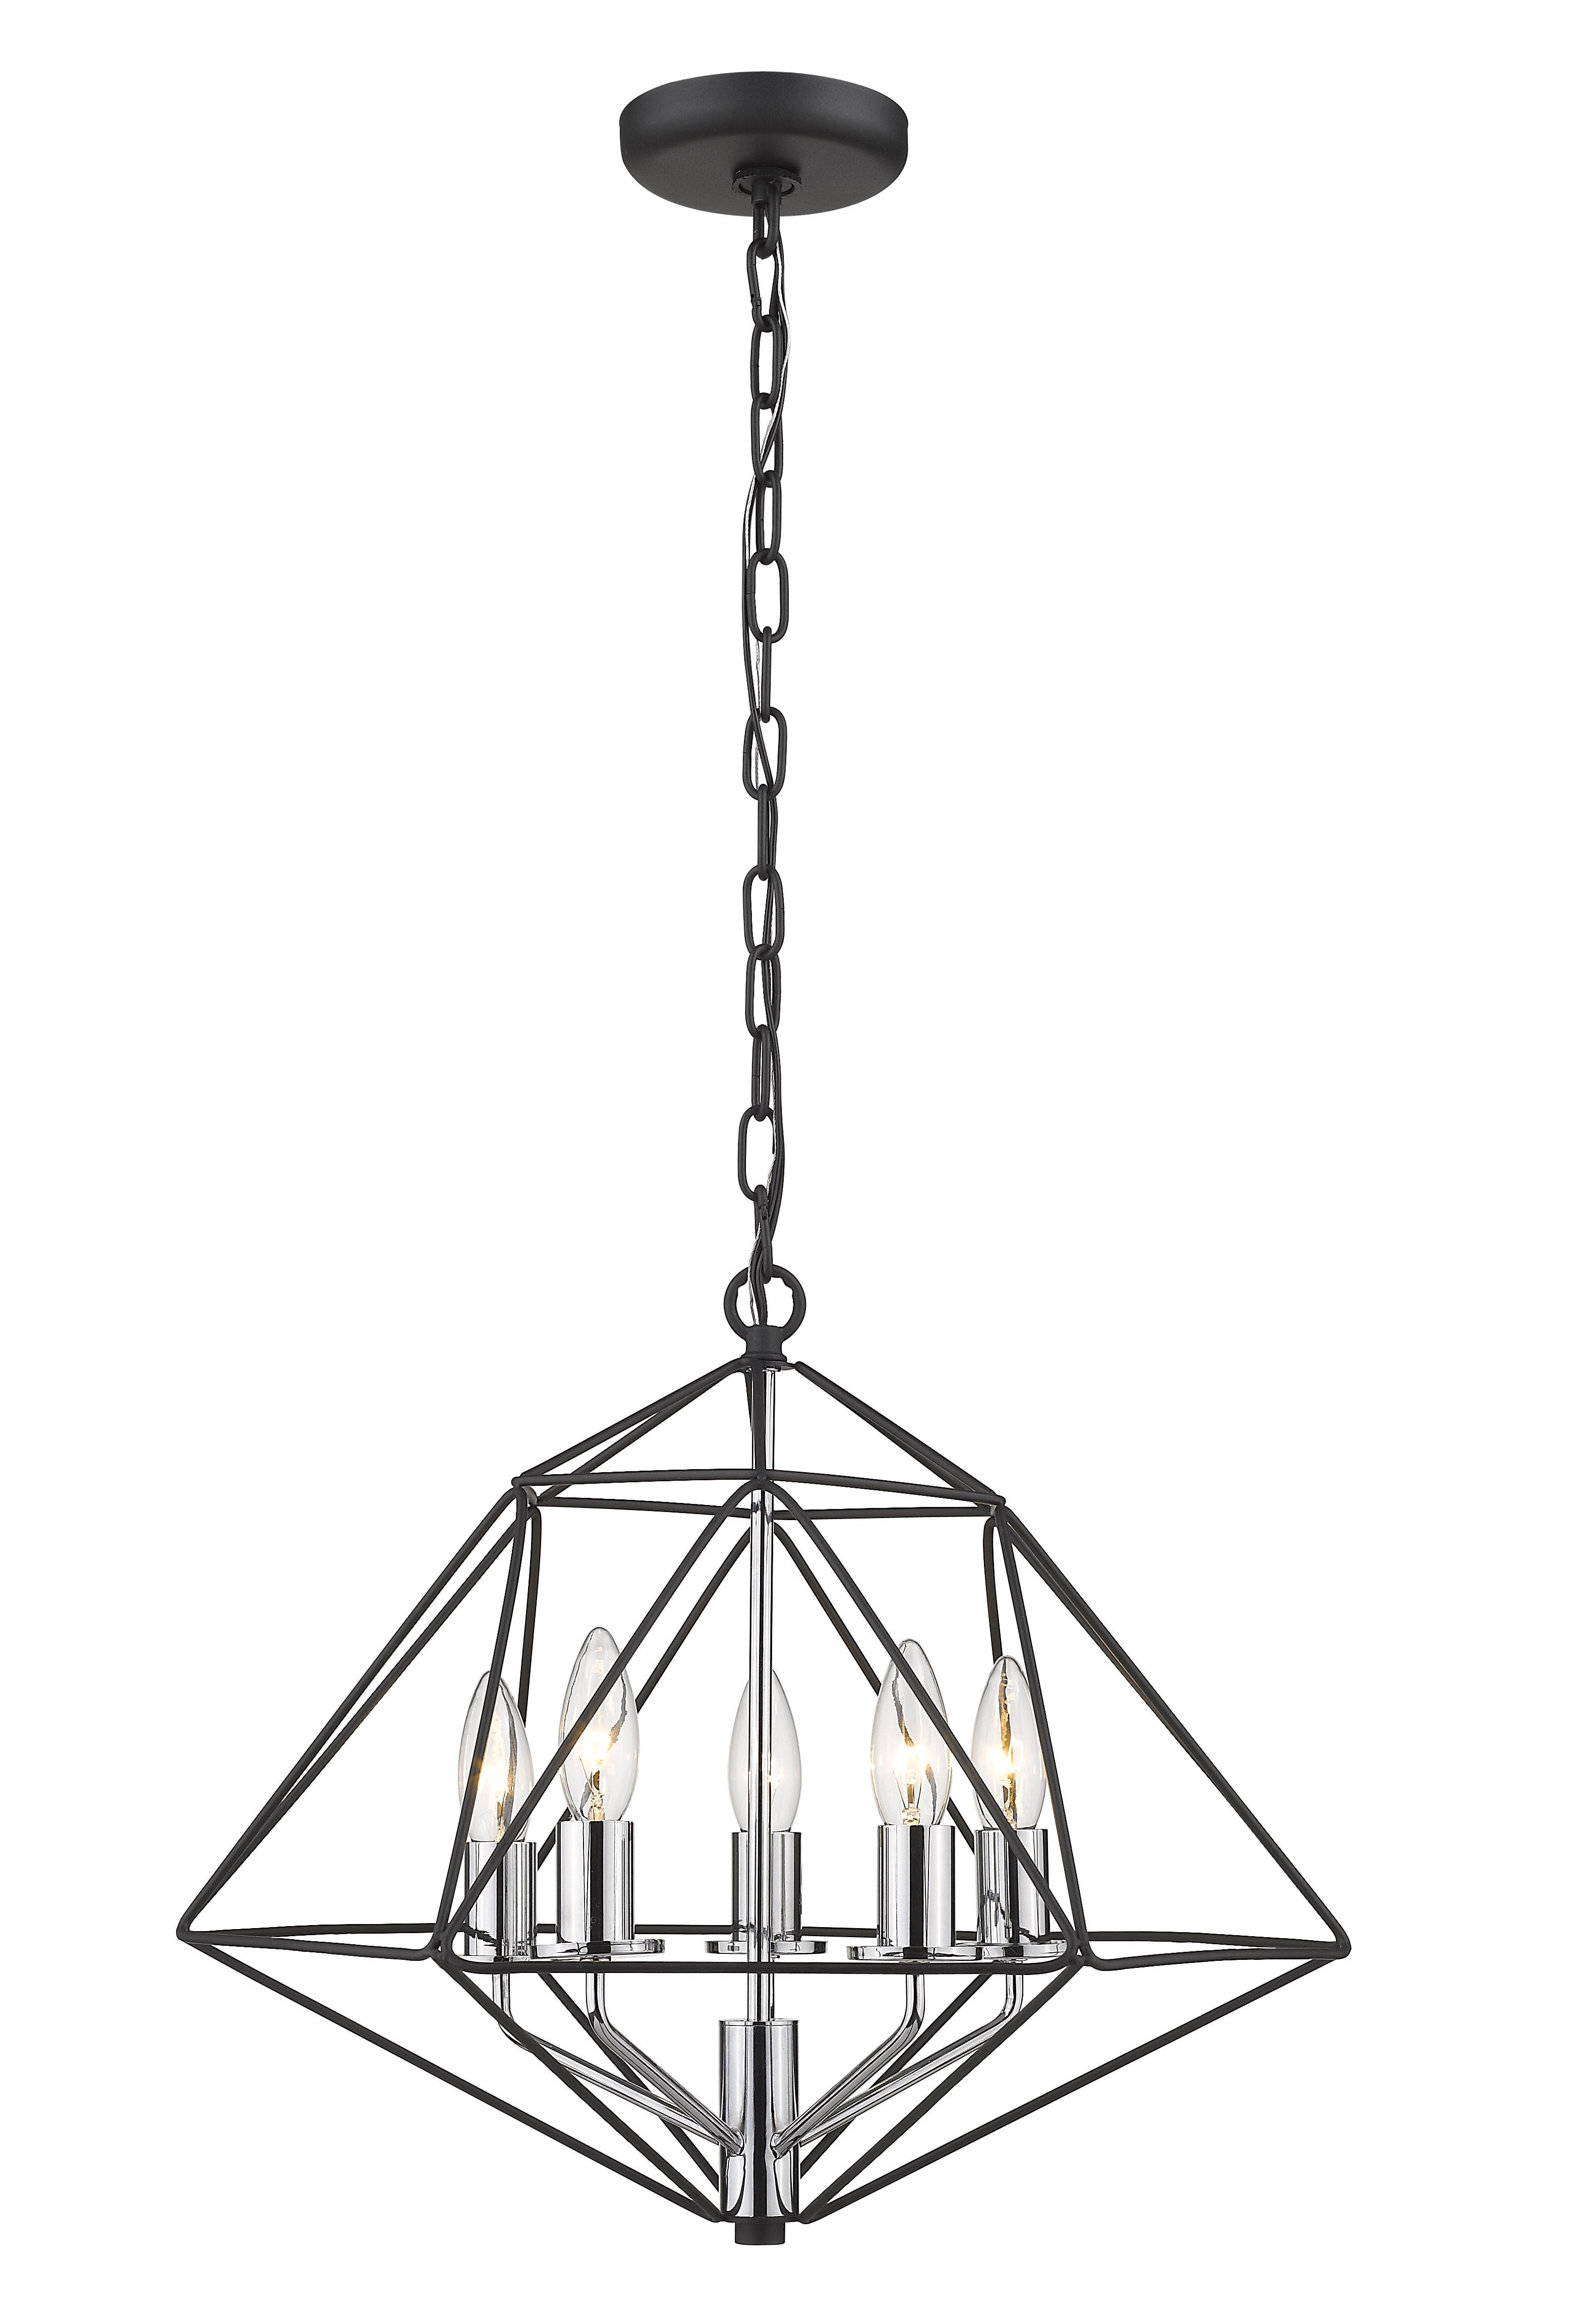 Rockland 4 Light Geometric Pendants With Preferred Kiesel 5 Light Geometric Pendant (View 2 of 20)